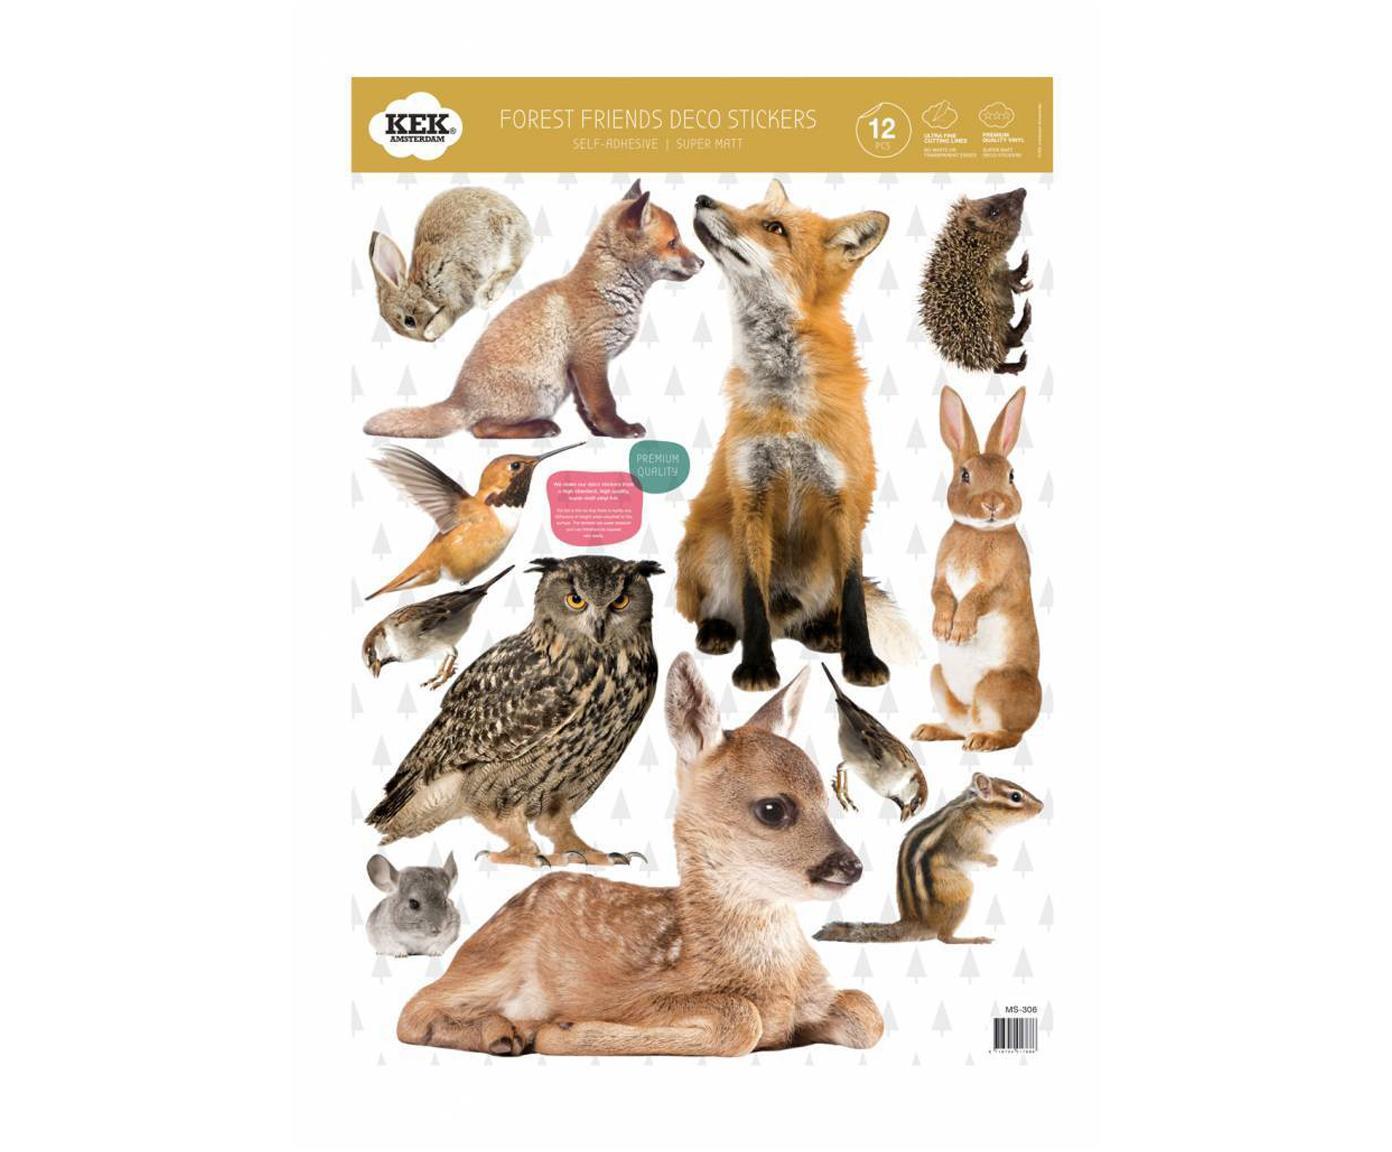 Wandstickersset Forest Friends, 12-delig, Zelfklevende vinyl folie, mat, Multicolour, 42 x 59 cm